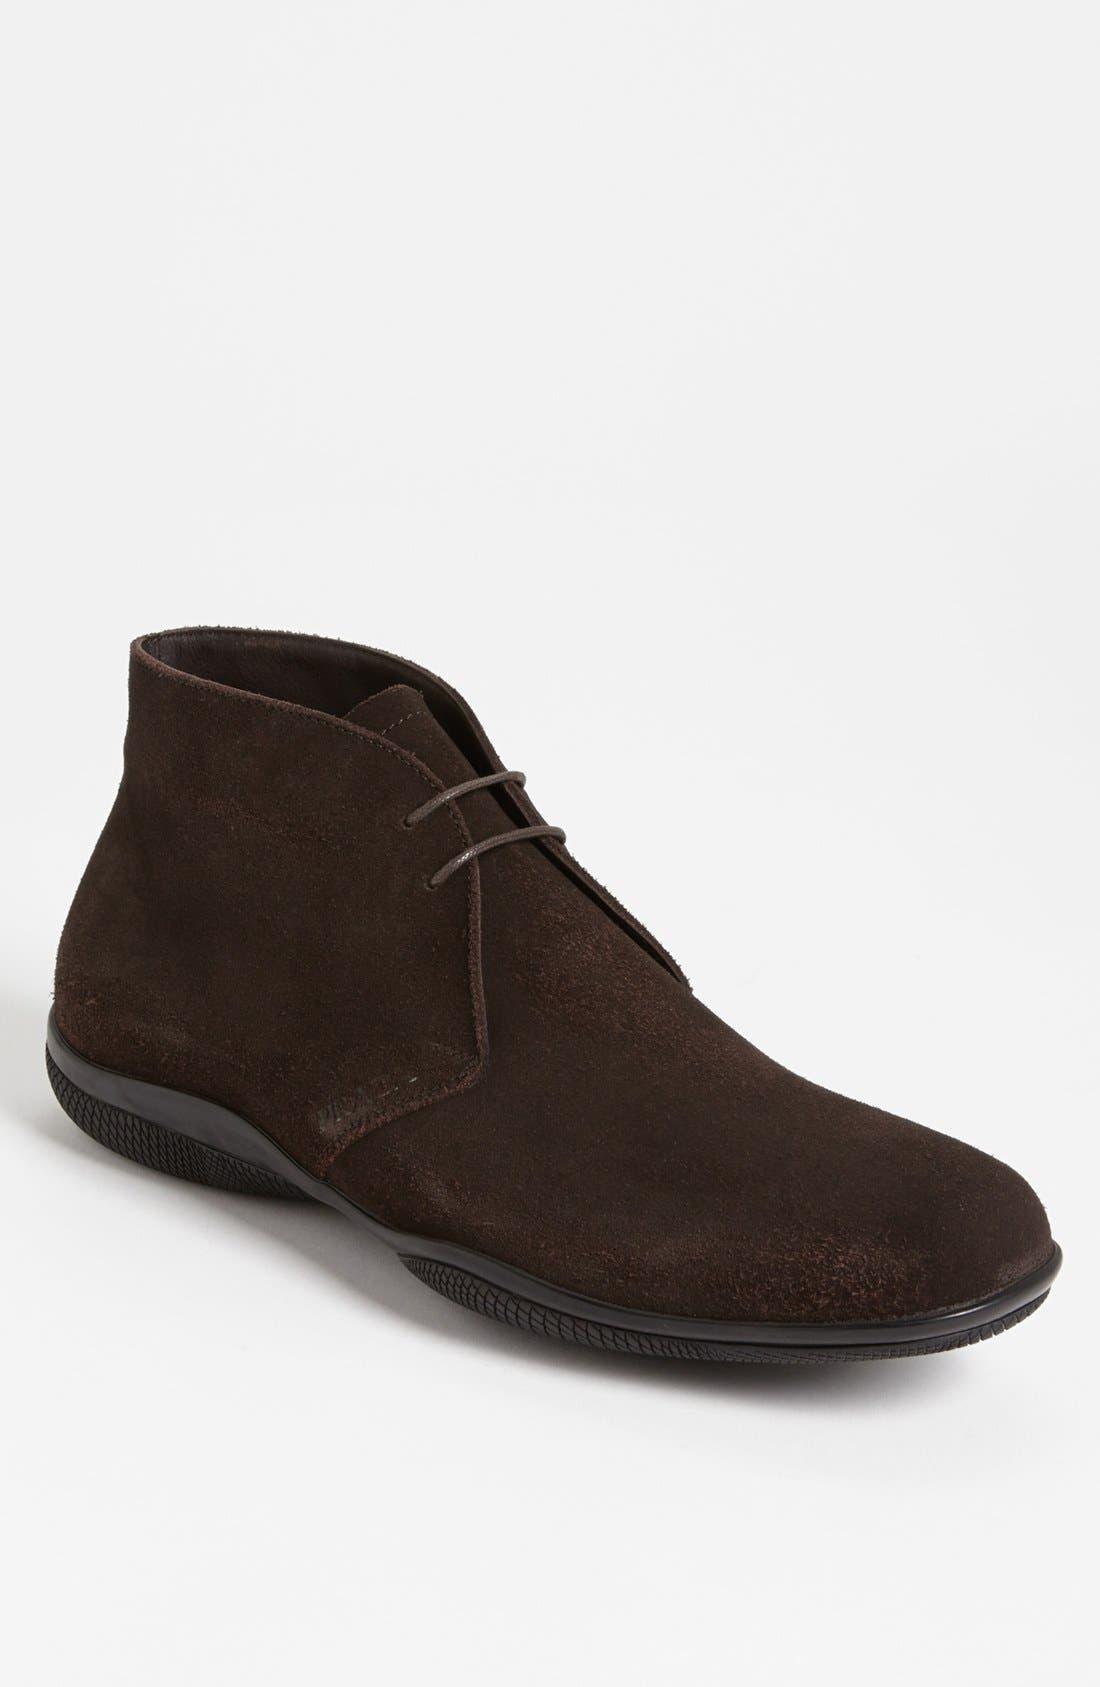 Main Image - Prada 'Toblac' Chukka Boot